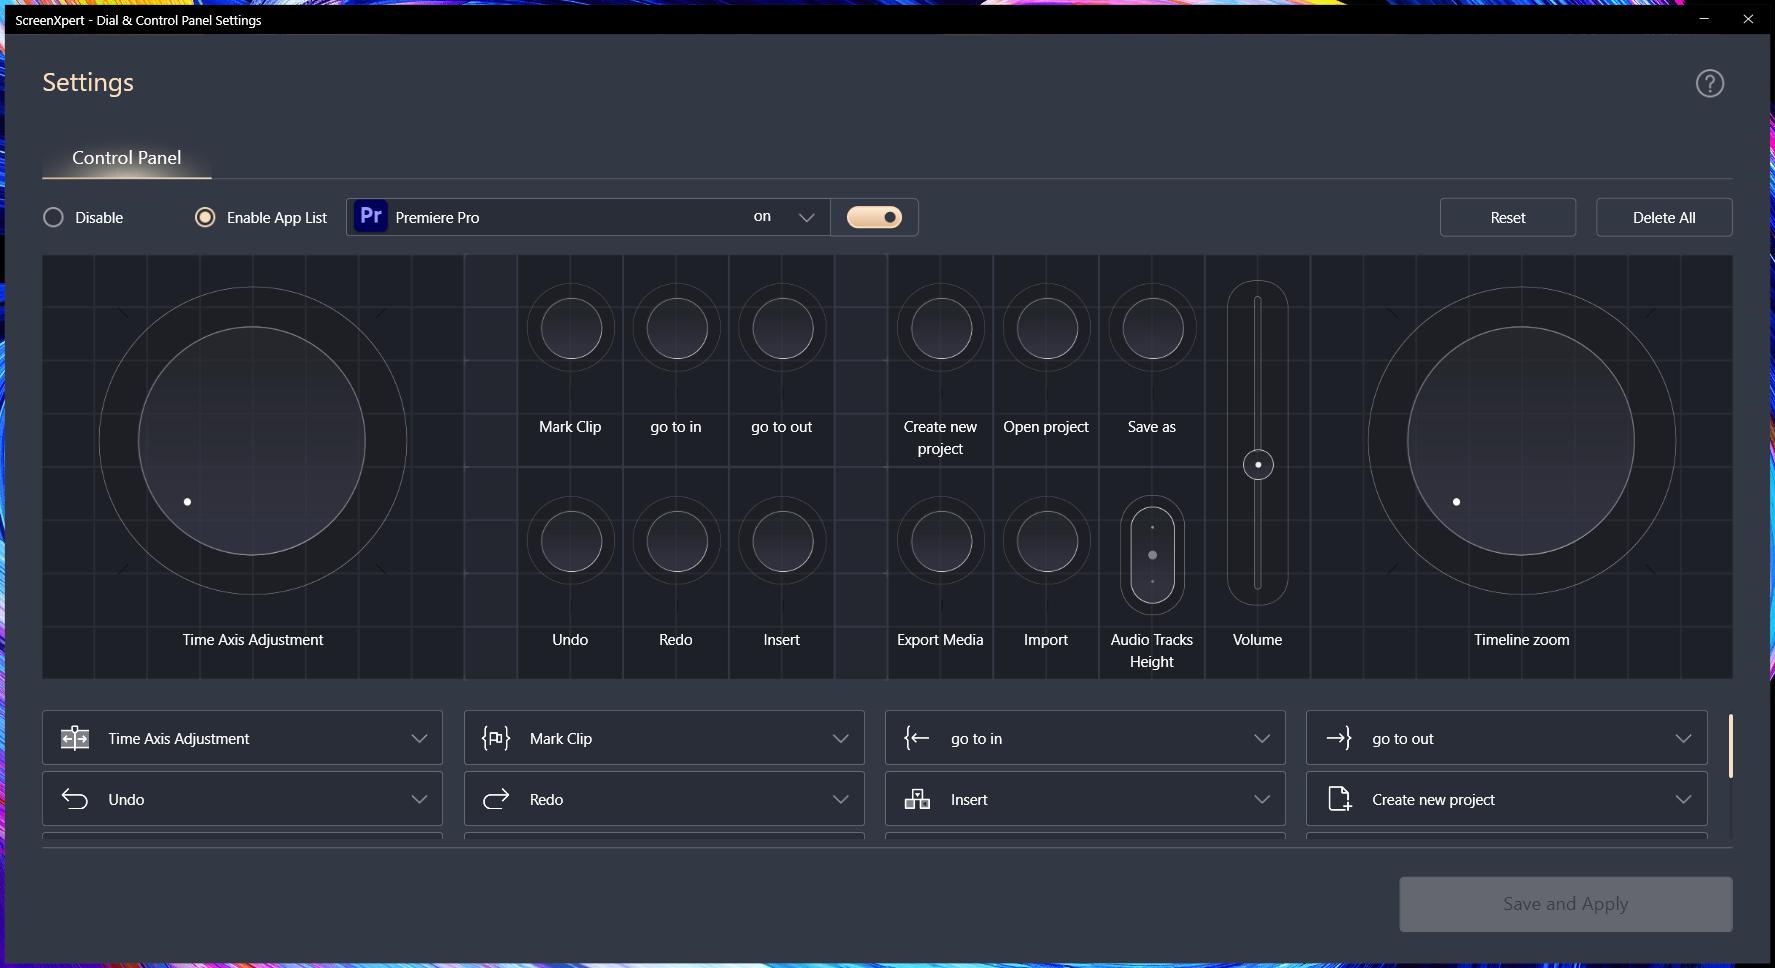 Пример панели инструментов для Adobe Premiere Pro